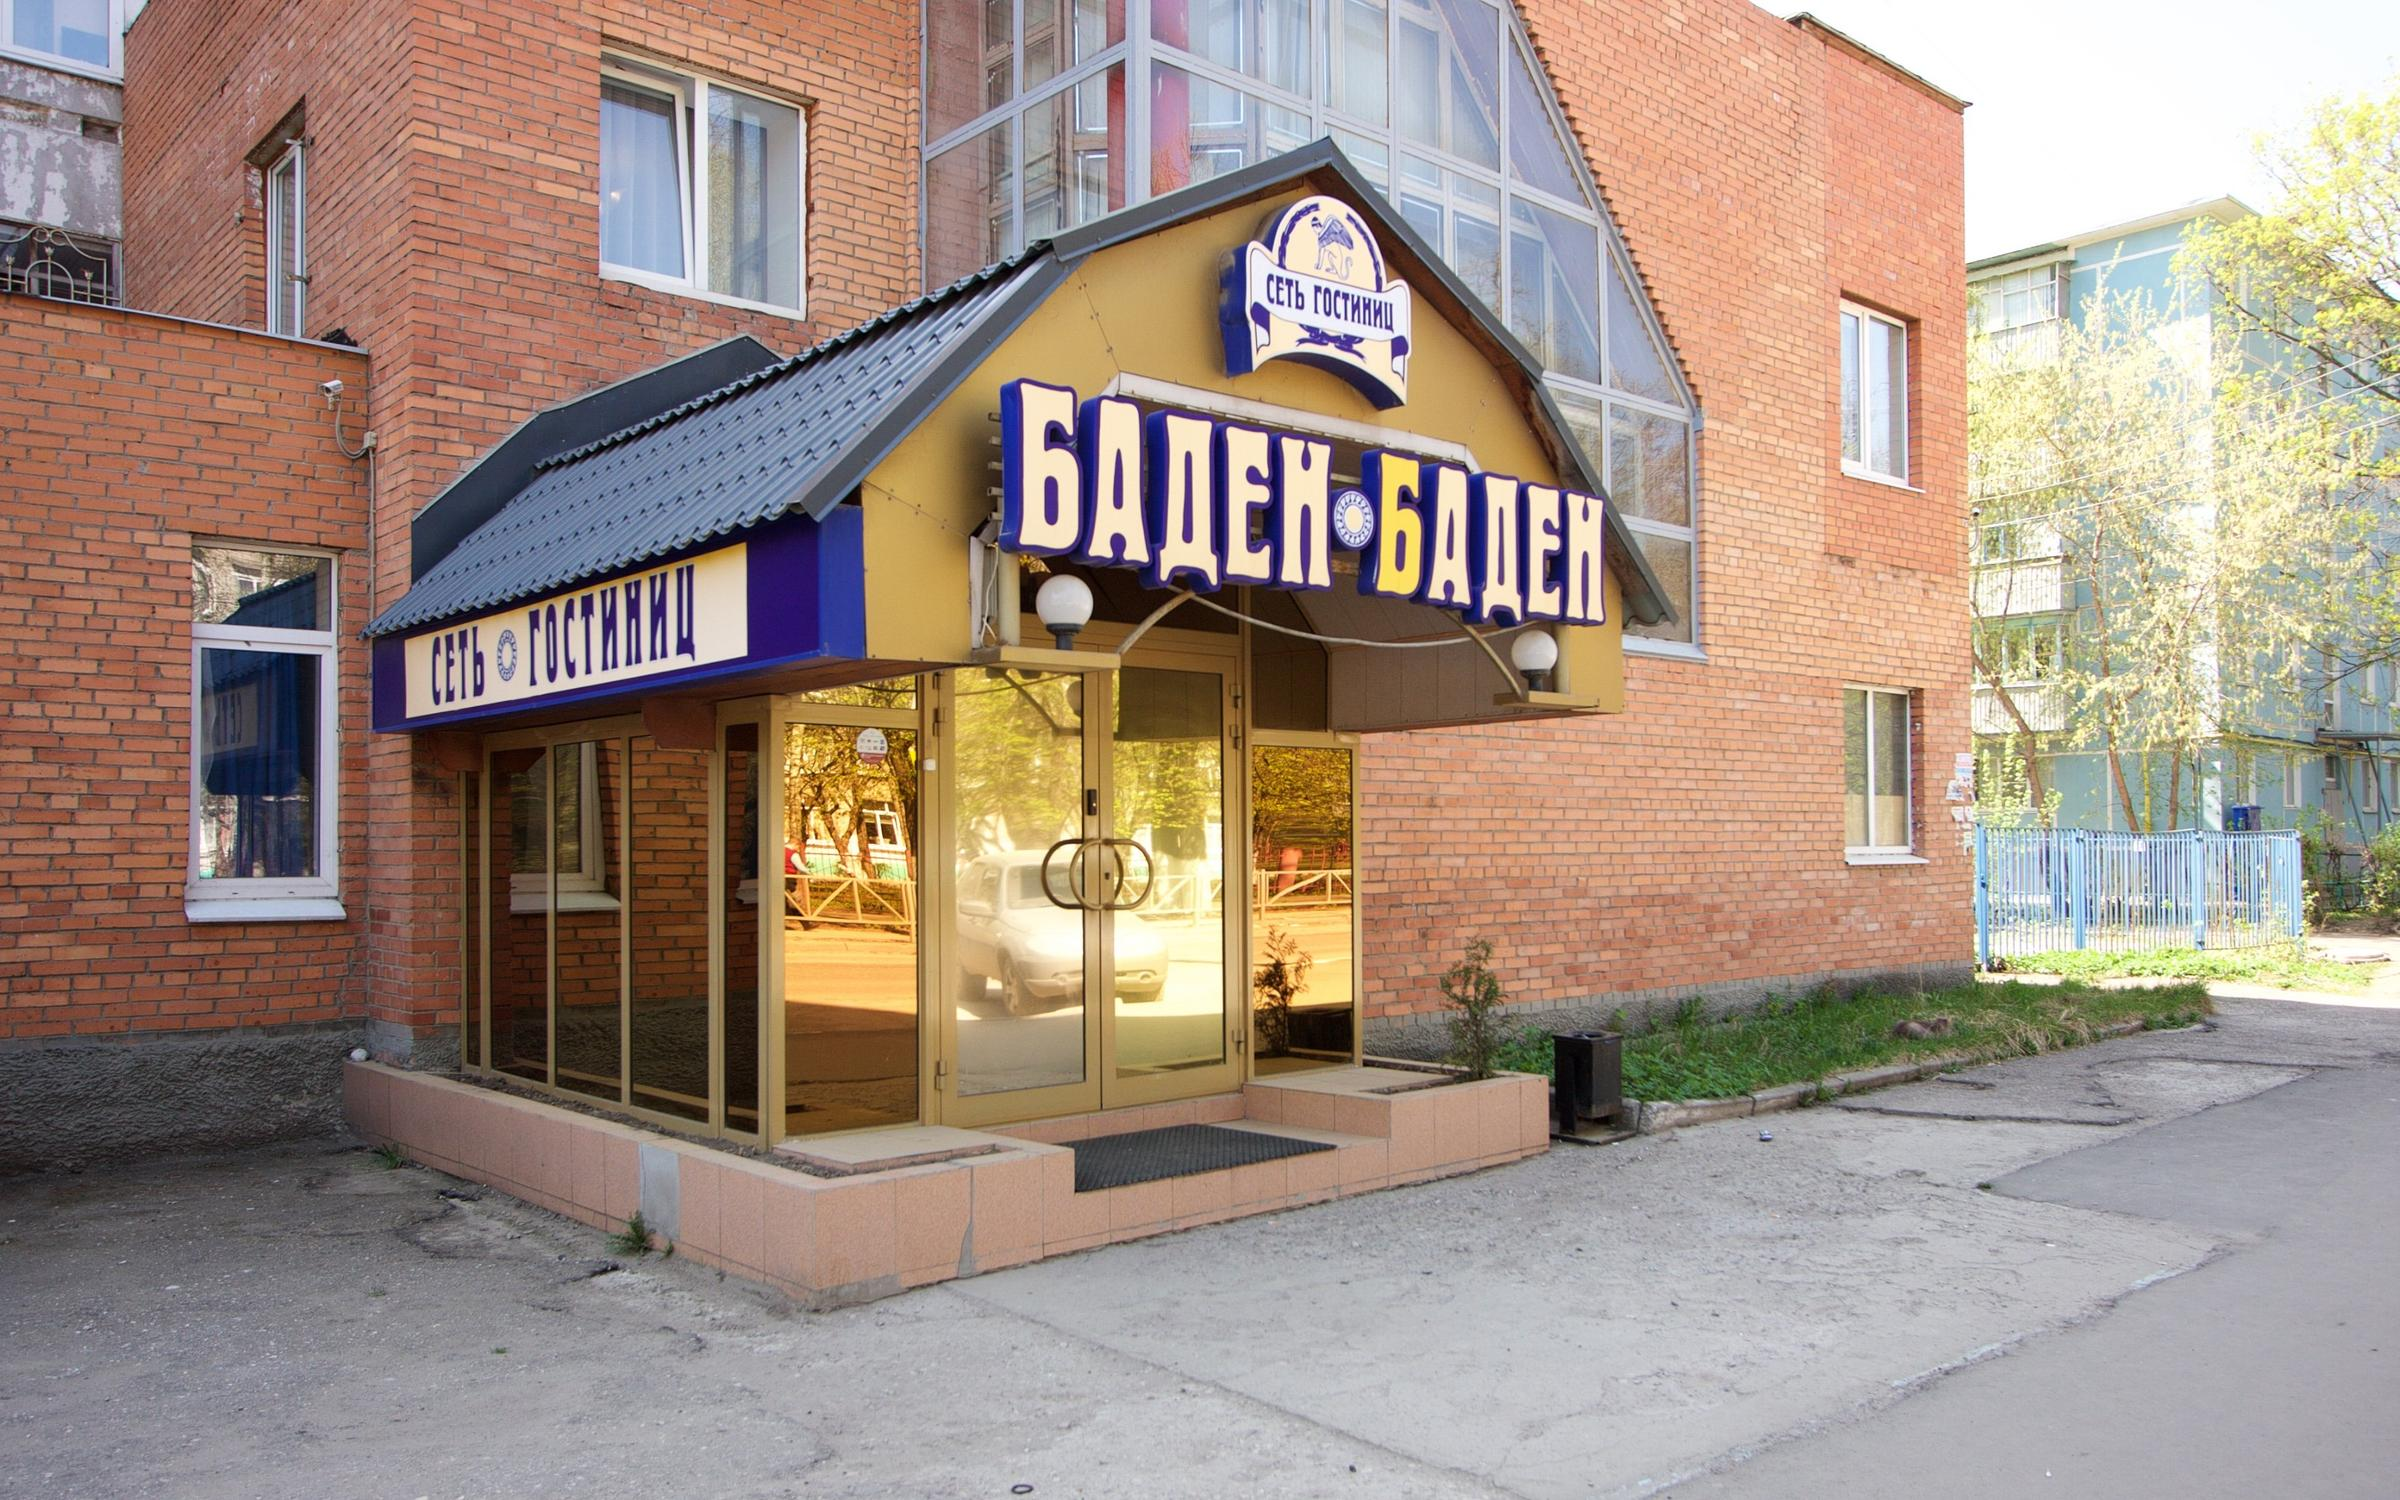 фотография Гостиницы Баден-Баден на улице Великанова